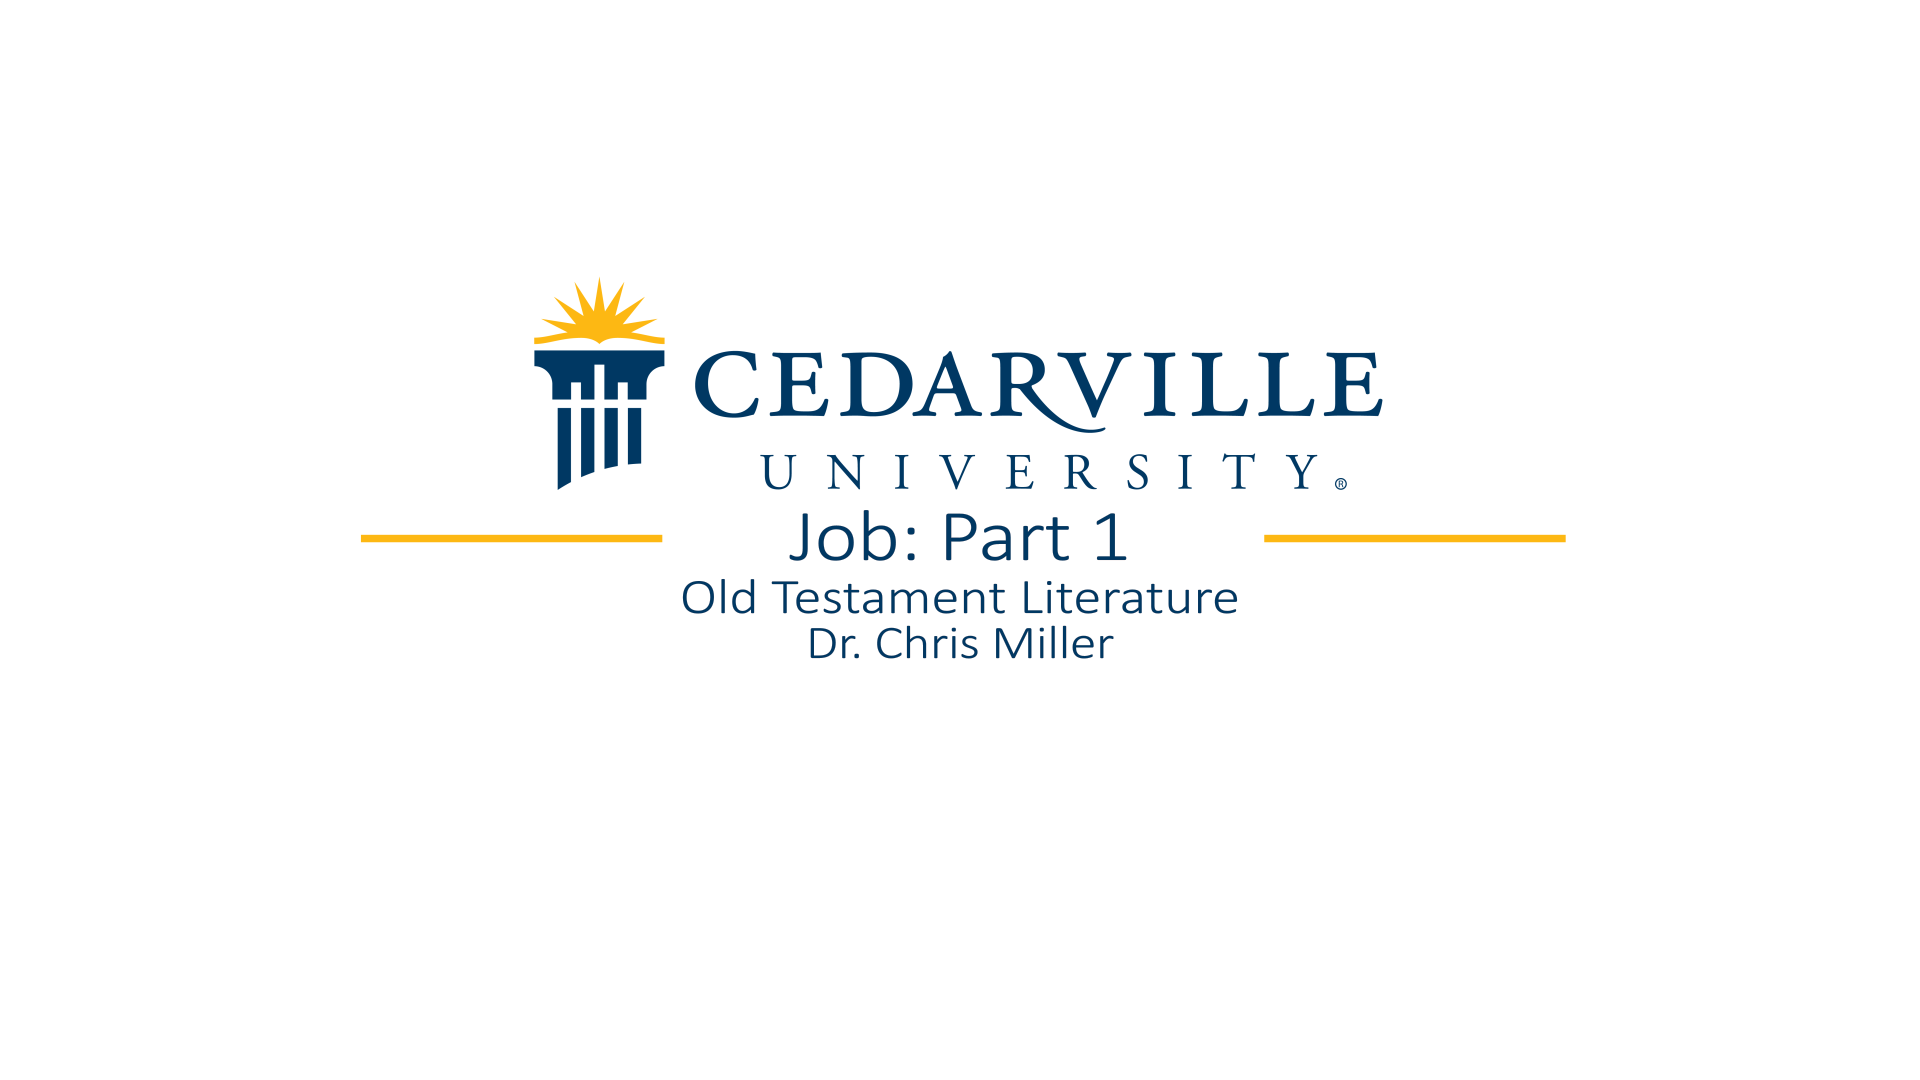 View thumbnail for Job: Part 1